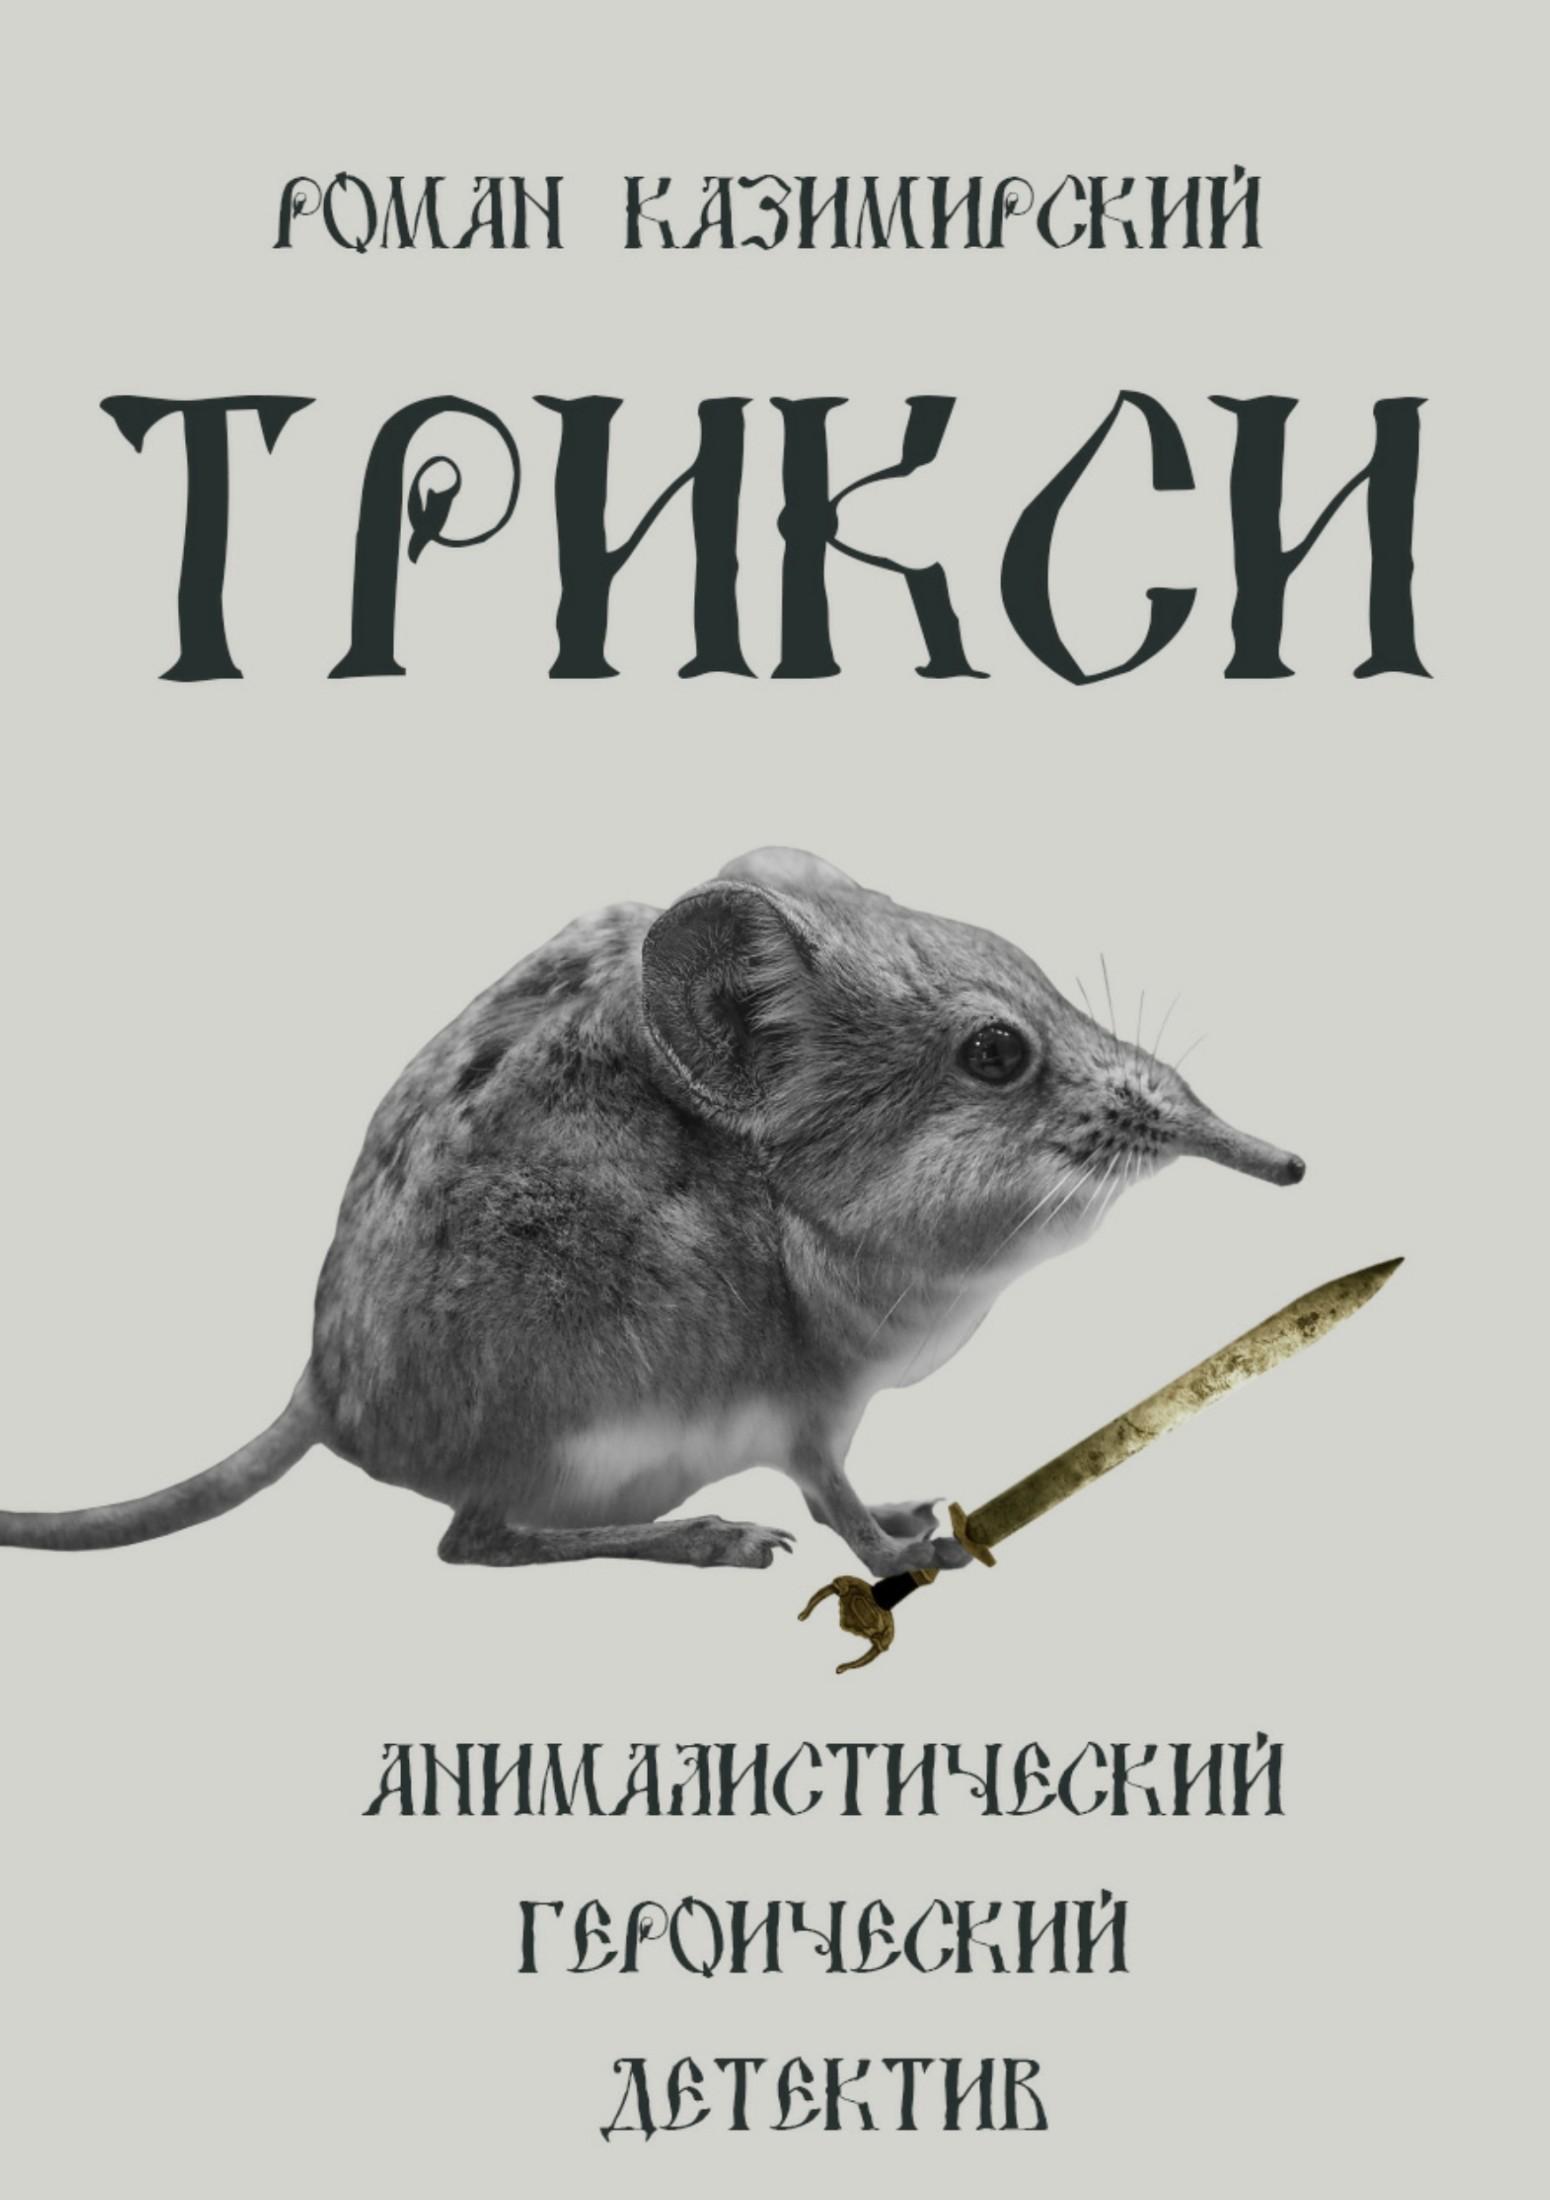 Роман Казимирский - Трикси